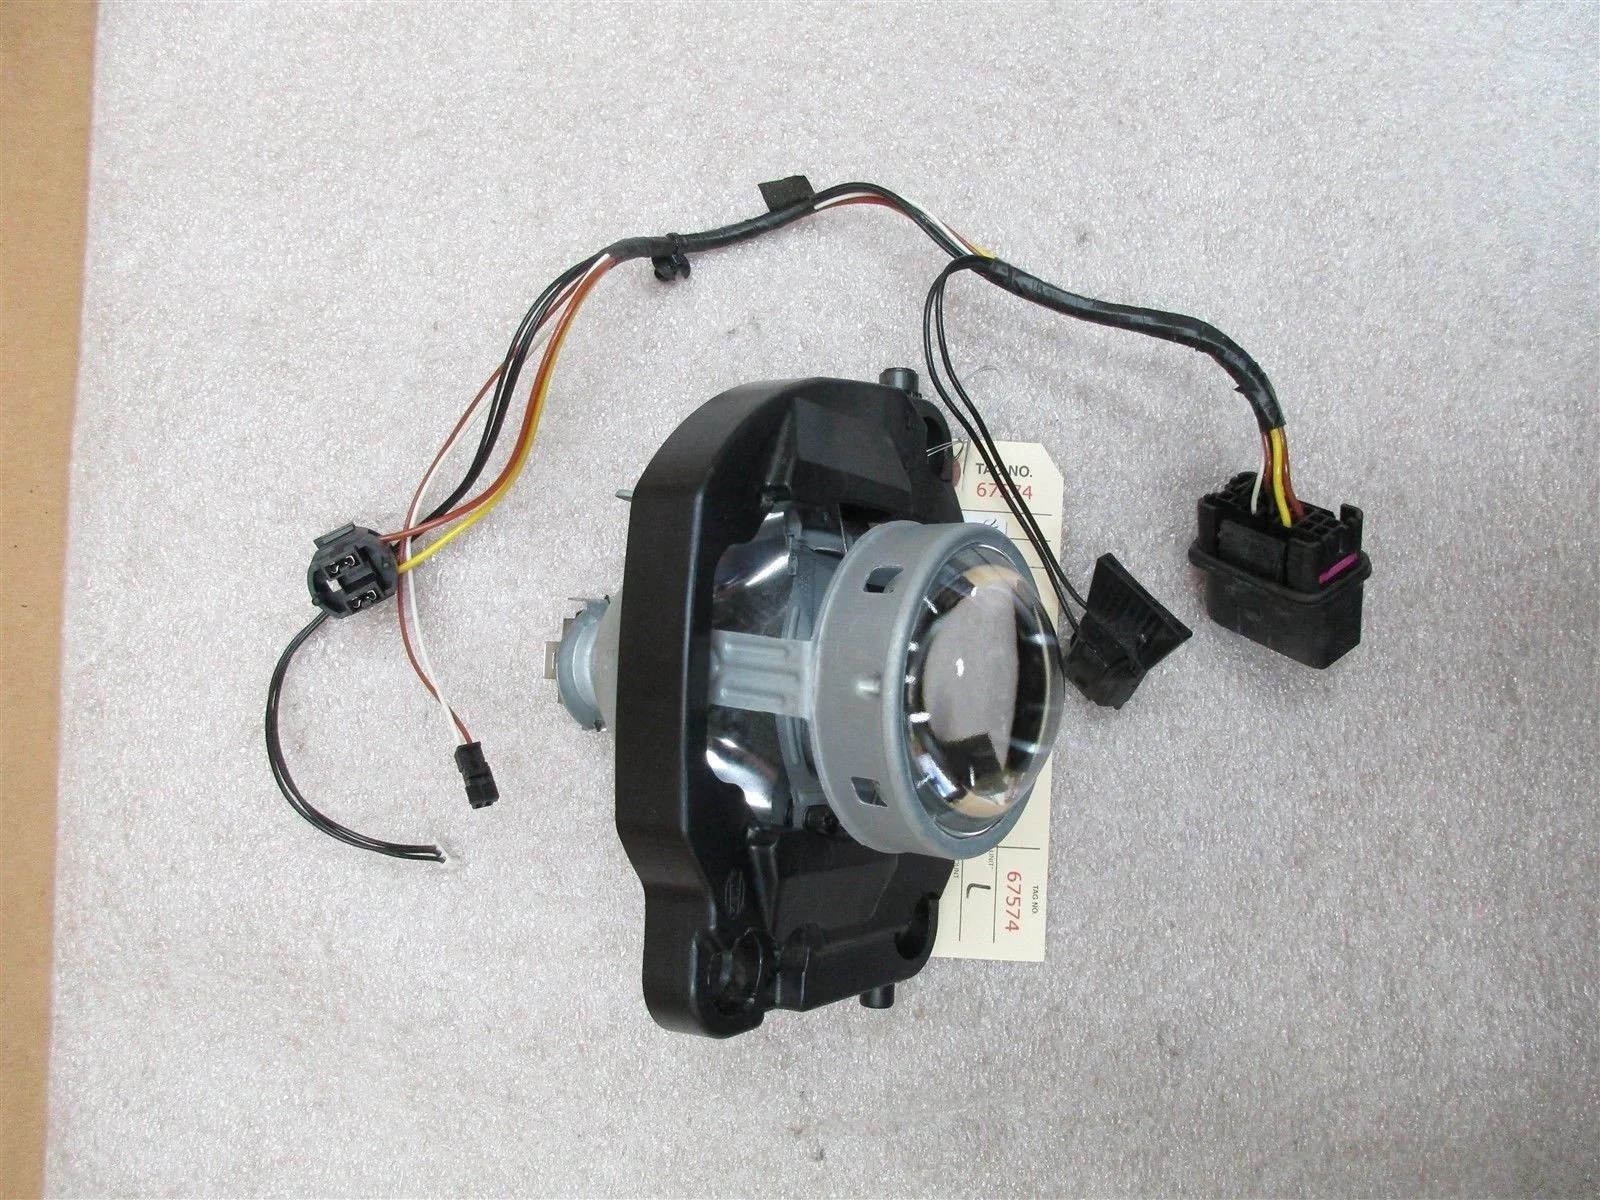 medium resolution of 08 cayenne s awd porsche 957 l headlight hardware wiring harness 122 873